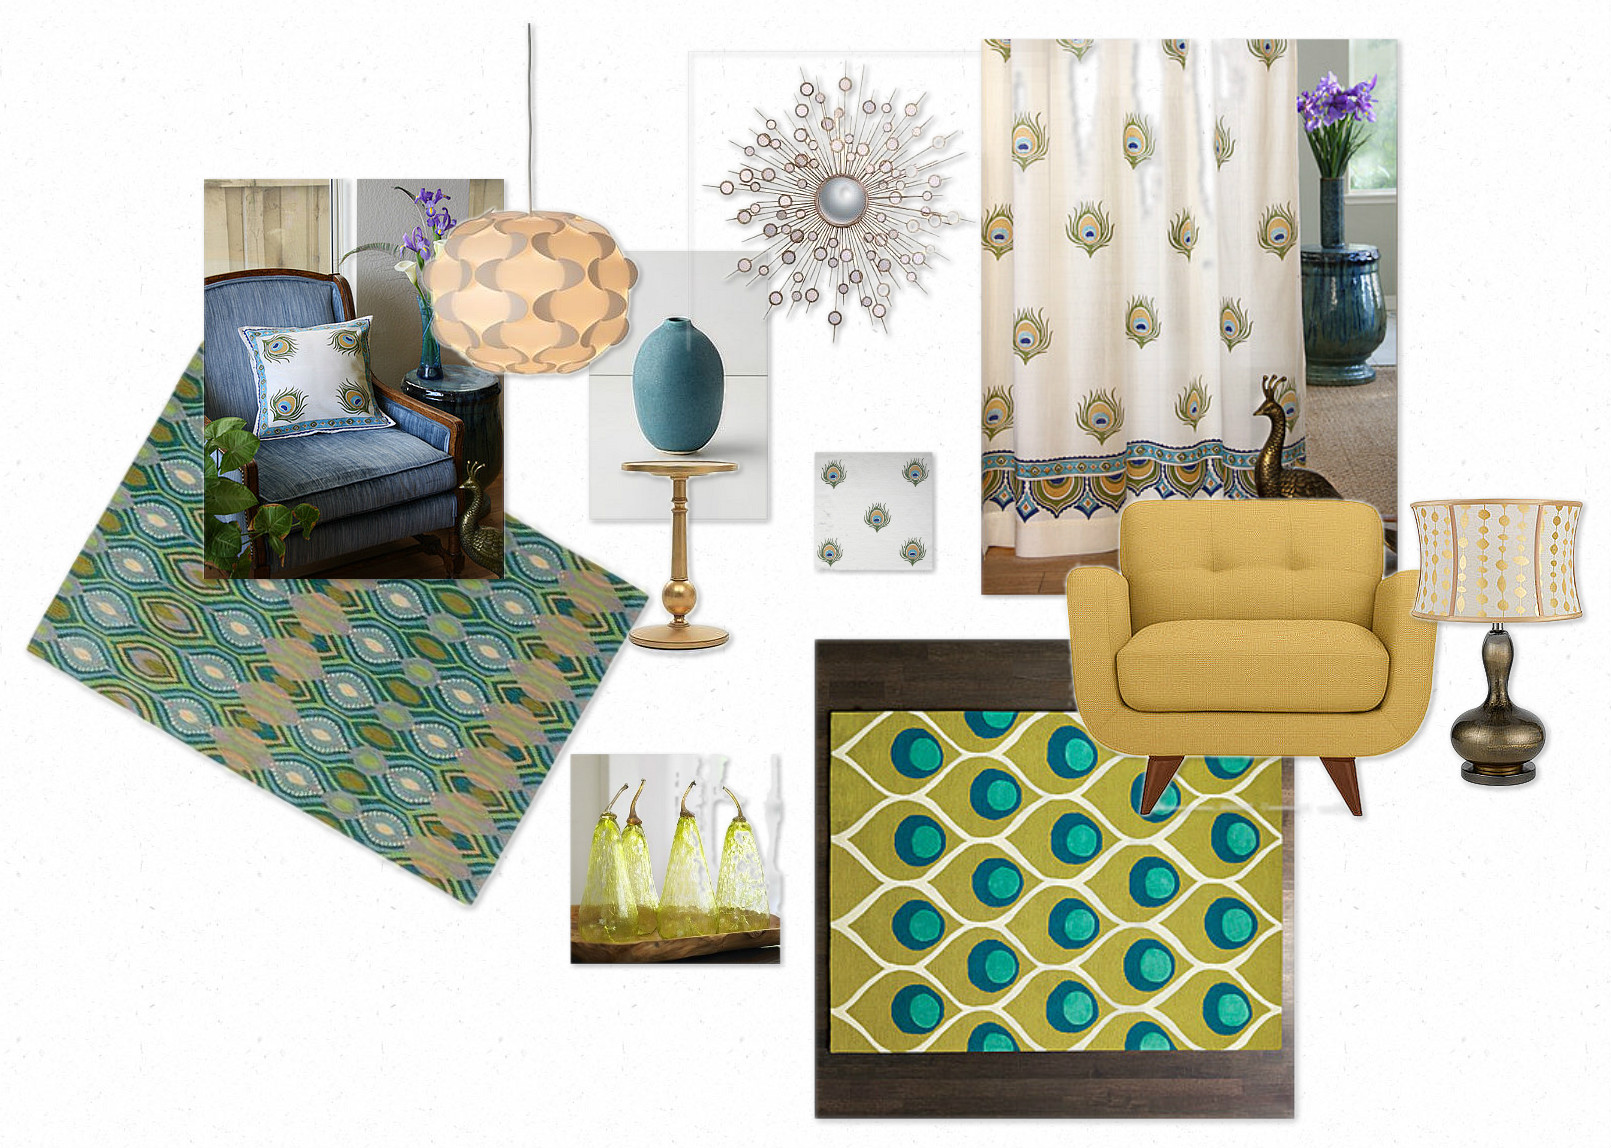 peacock living room decor.  Ideas for a Peacock Inspired Living Room Saffron Speak